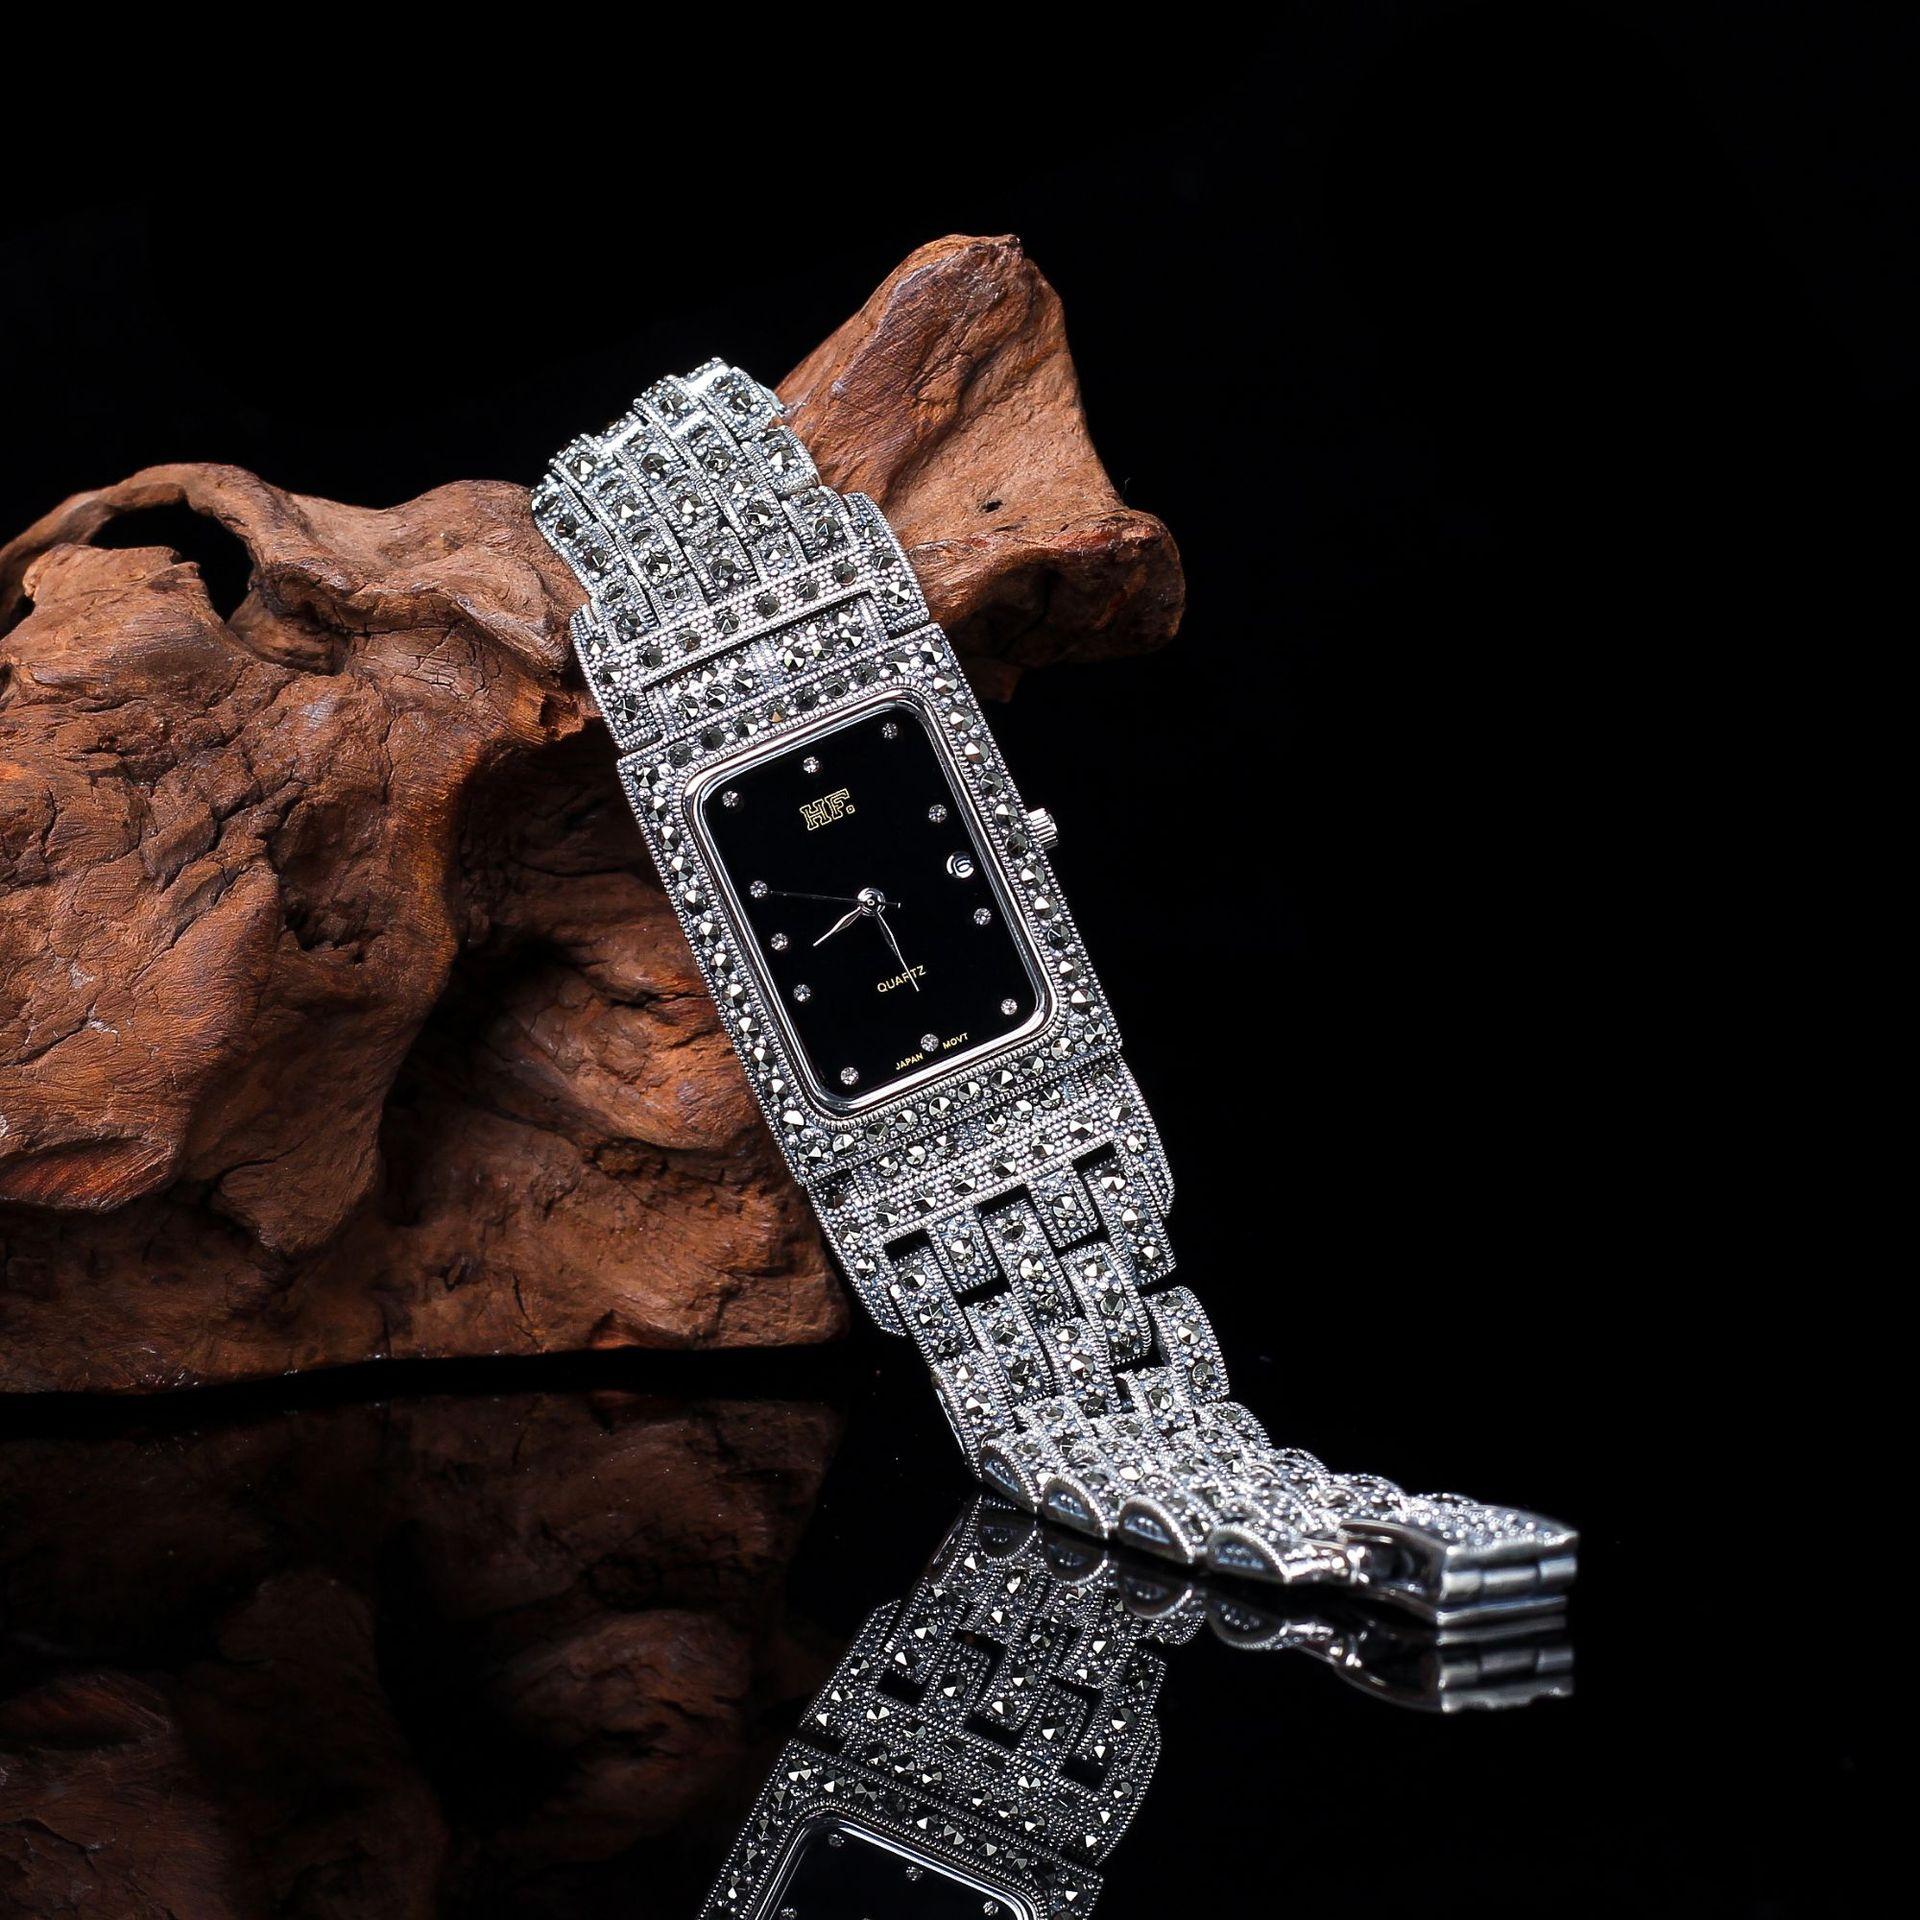 S925 Pure Silver Ornaments Seiko Thai Silver Bracelet Watch Both Men And Women